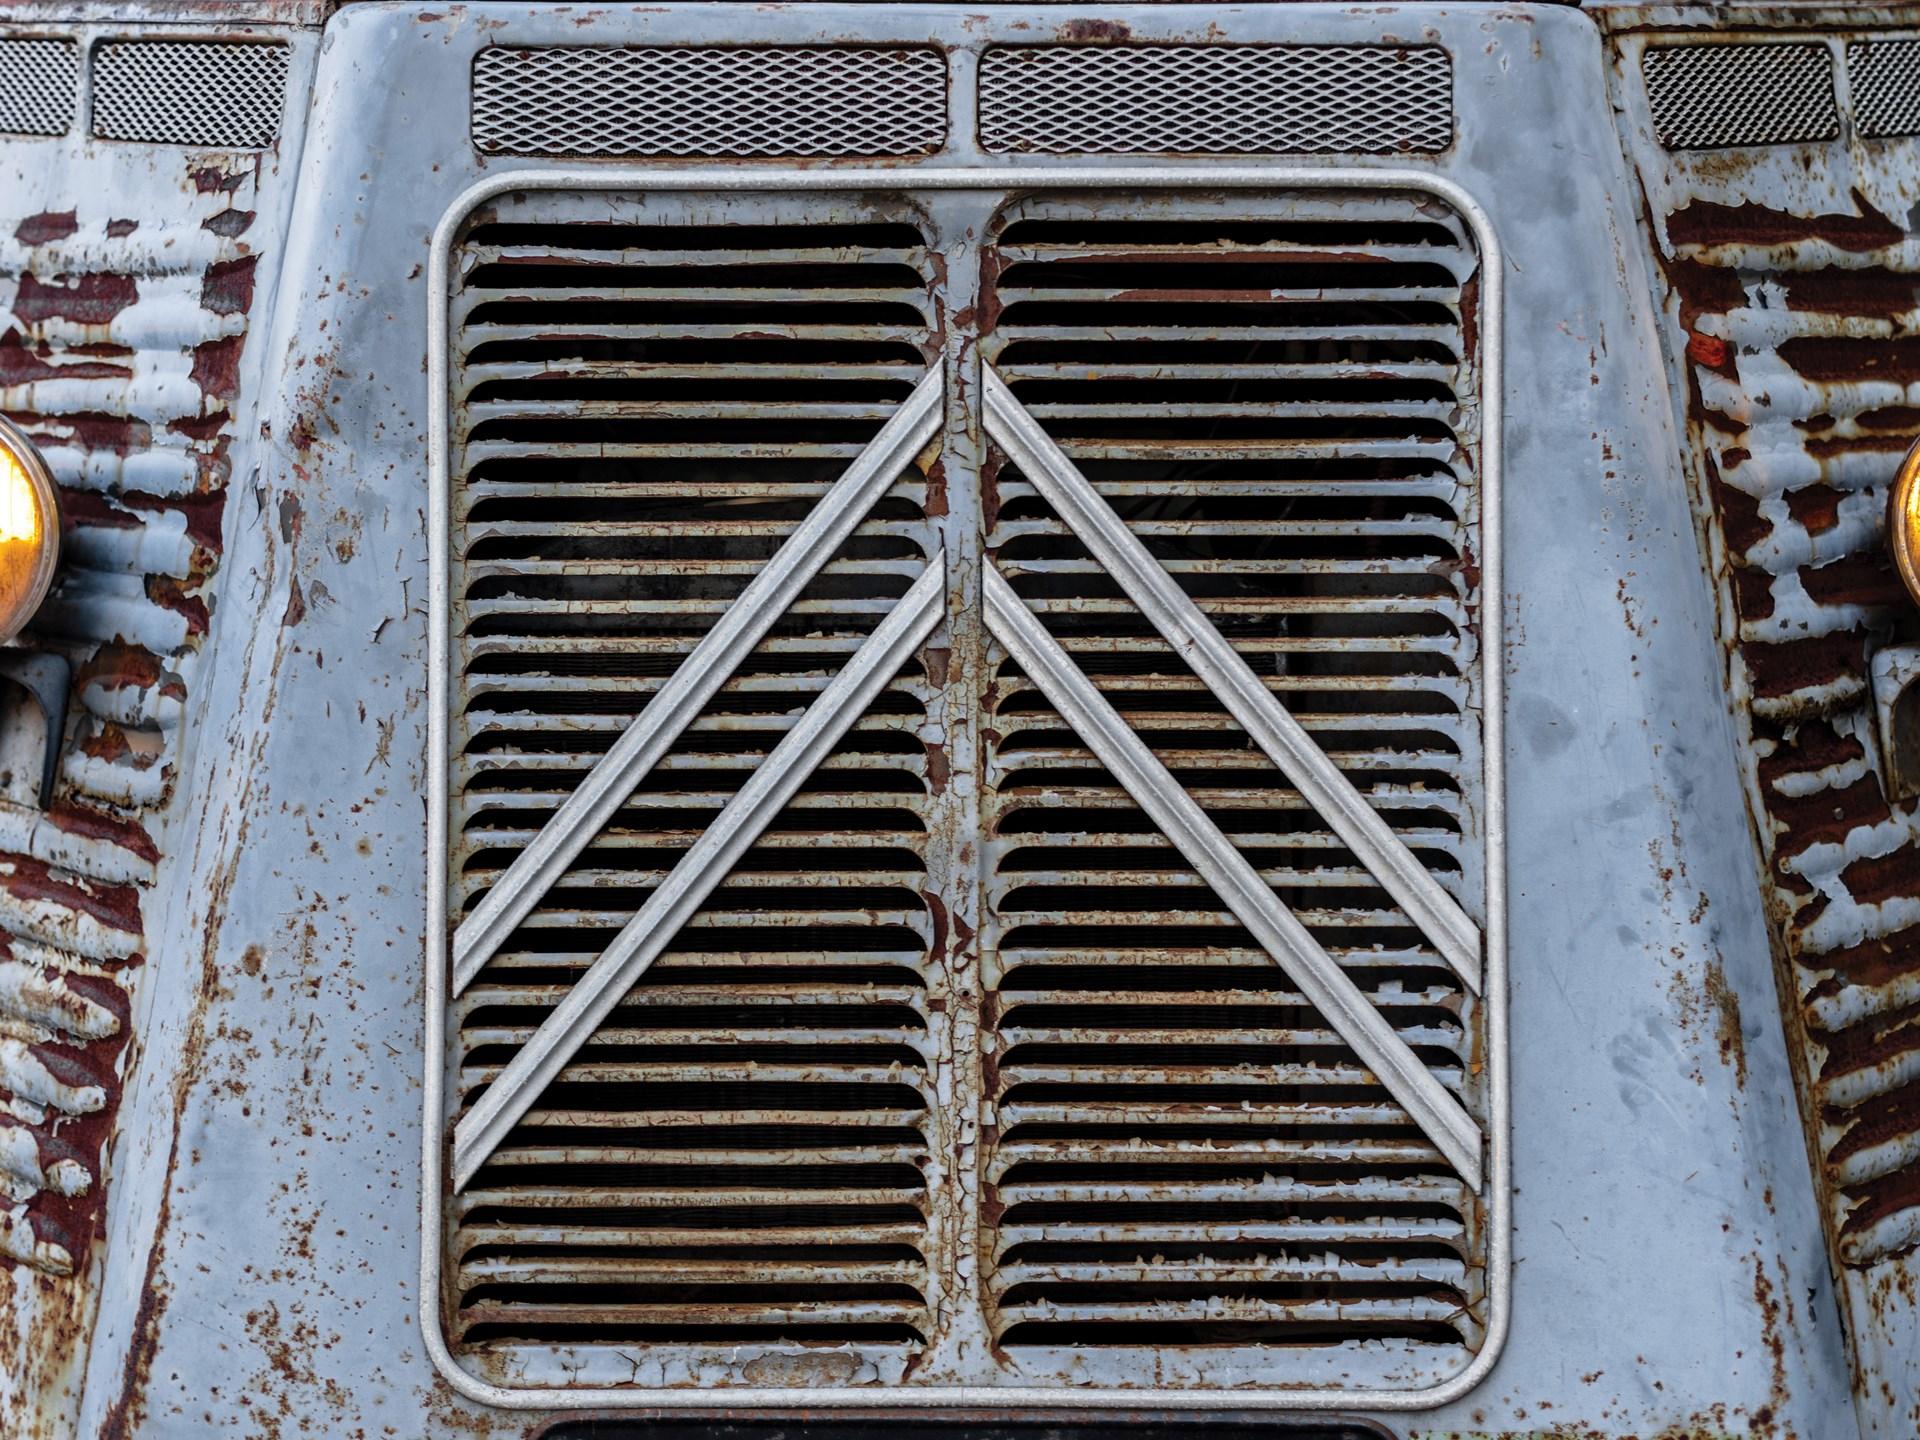 1950 Citroën HY Panelvan